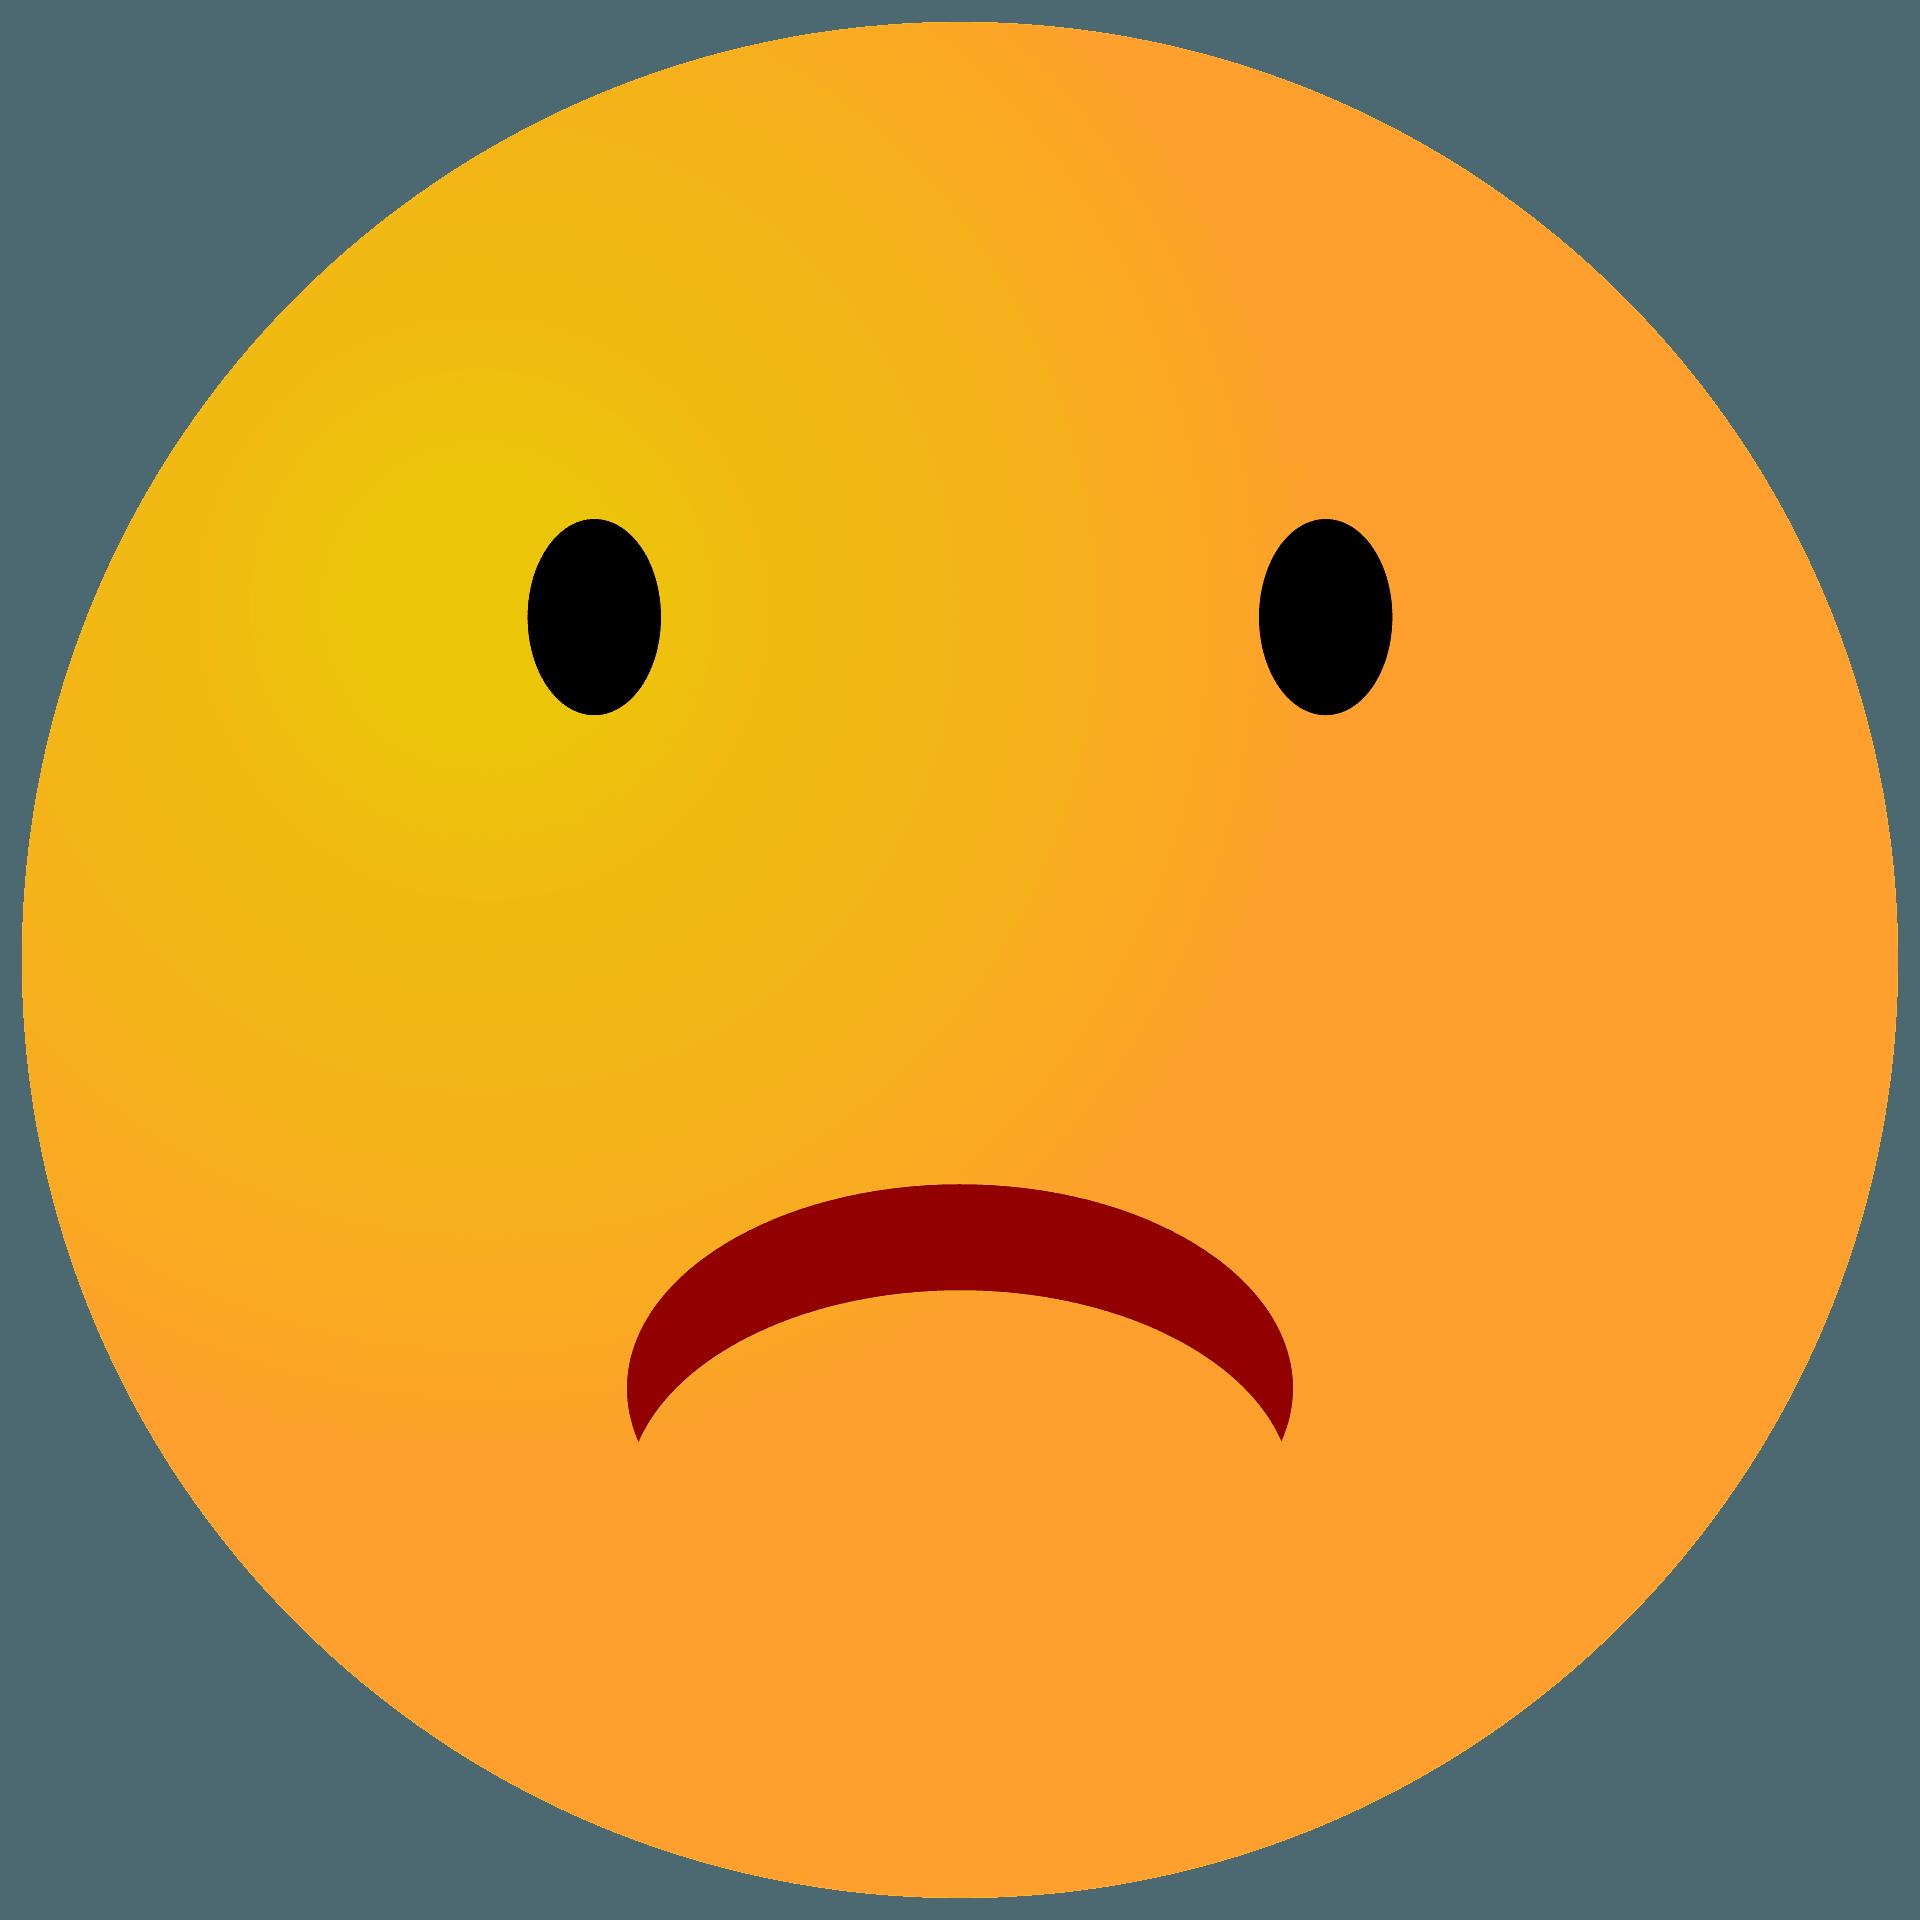 Crying Sad Emoji Png - Sad Face Emoji Transparent Background , Free  Transparent Clipart - ClipartKey